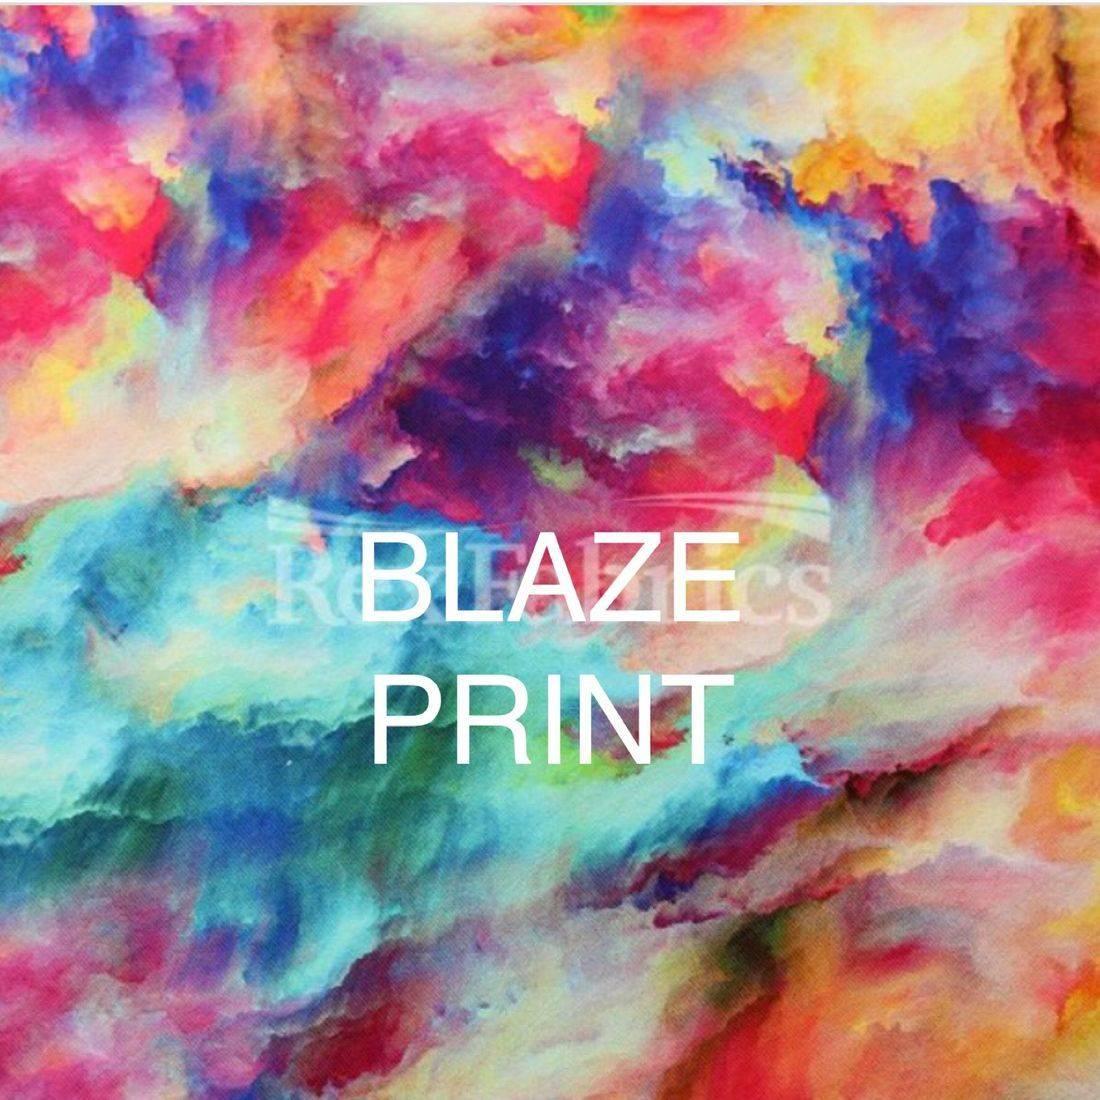 Ablaze print